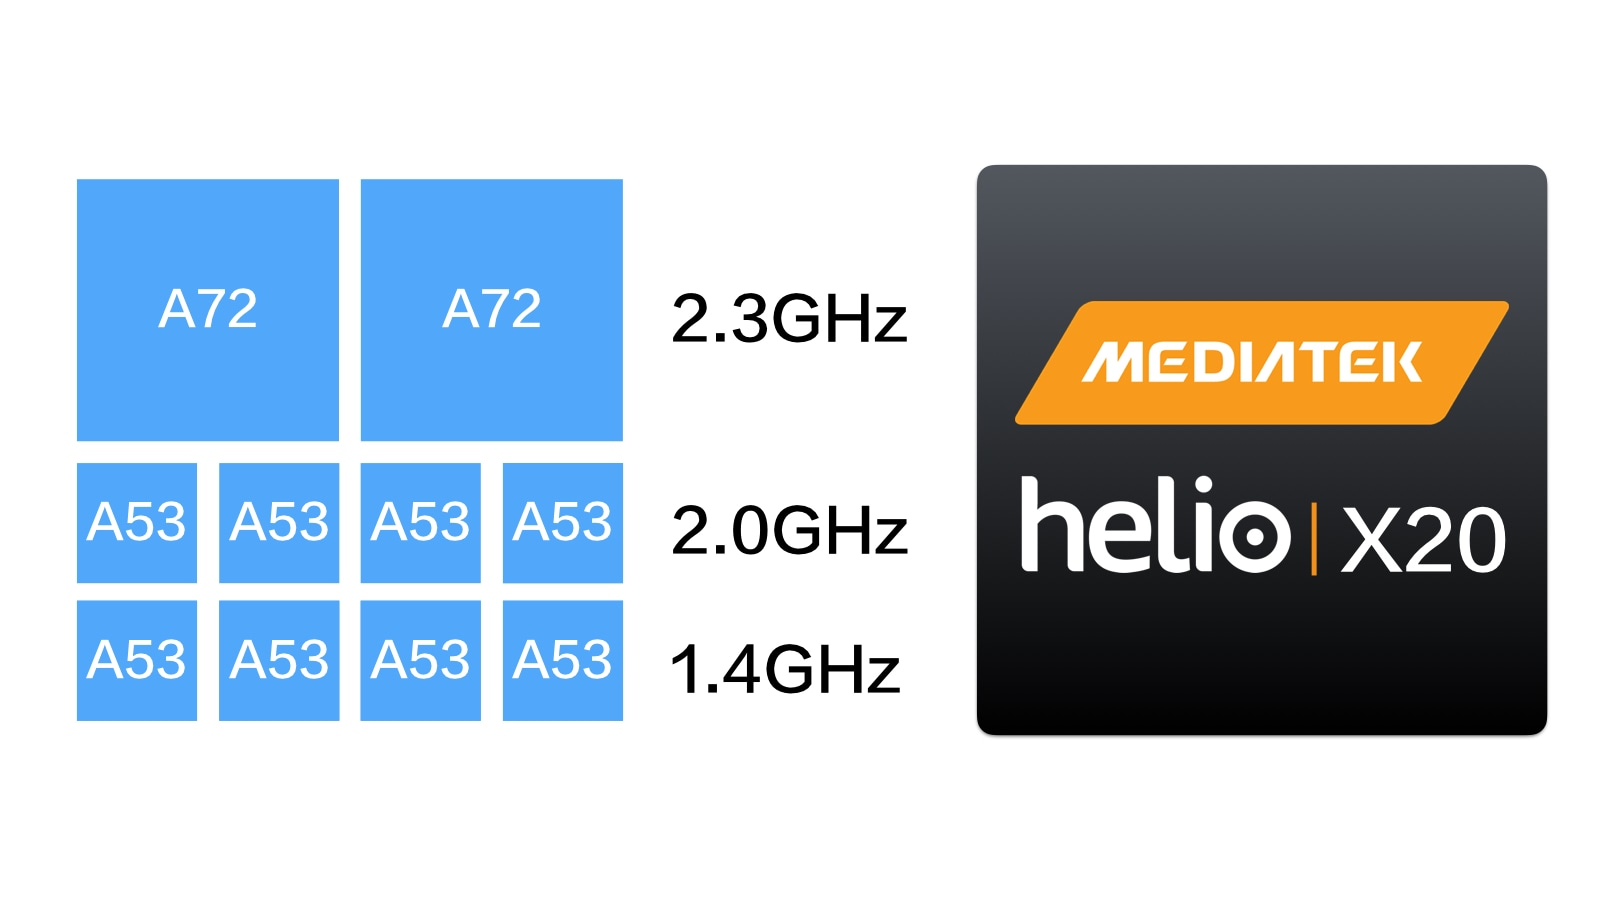 Elephone S7 MediaTek X20